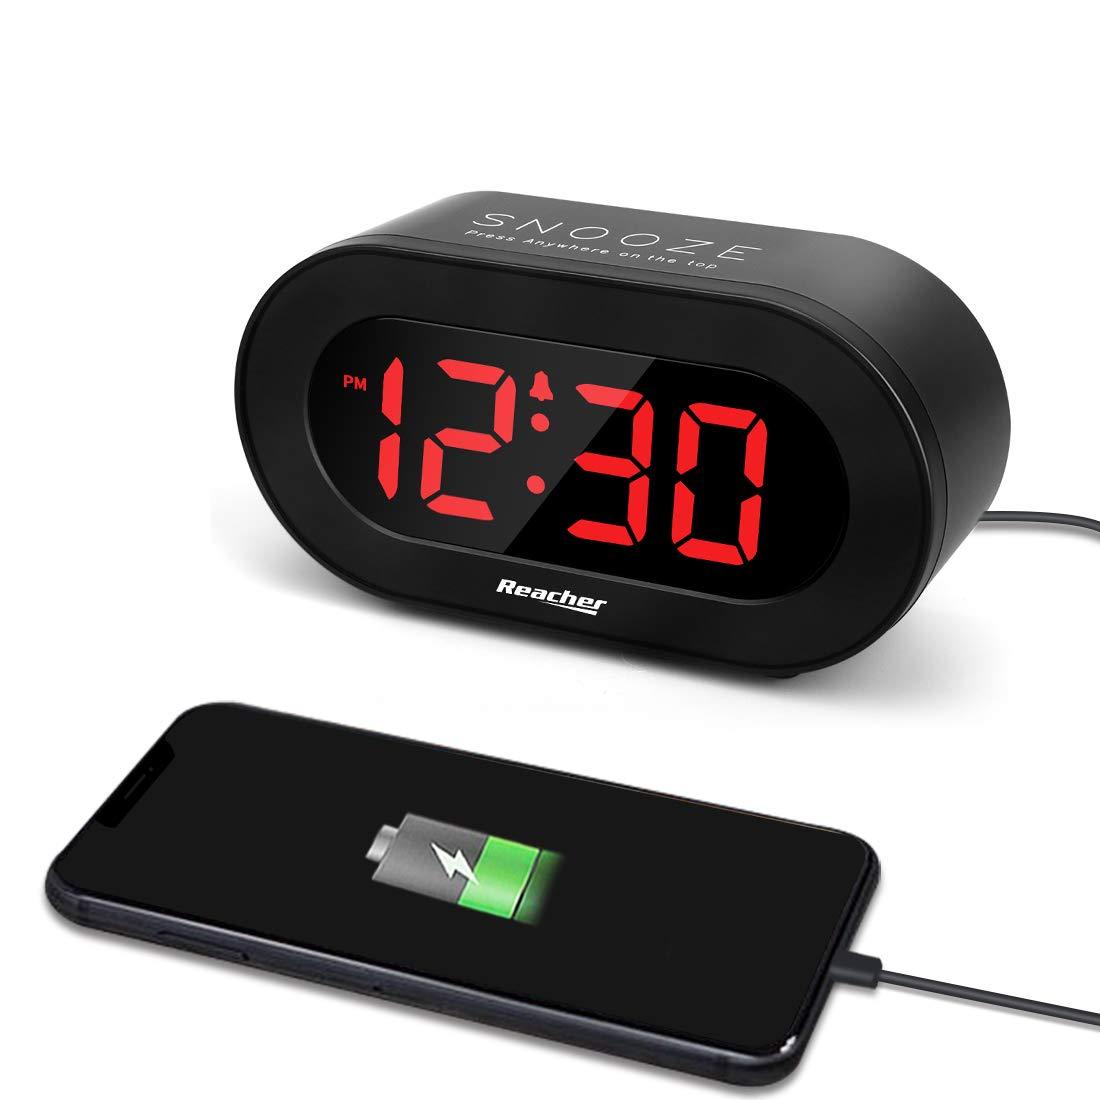 REACHER Small LED Digital Alarm Clock - 0-100% Dimmer, Easy Snooze, Adjustable Alarm Volume, USB Phone Charger Port, Black